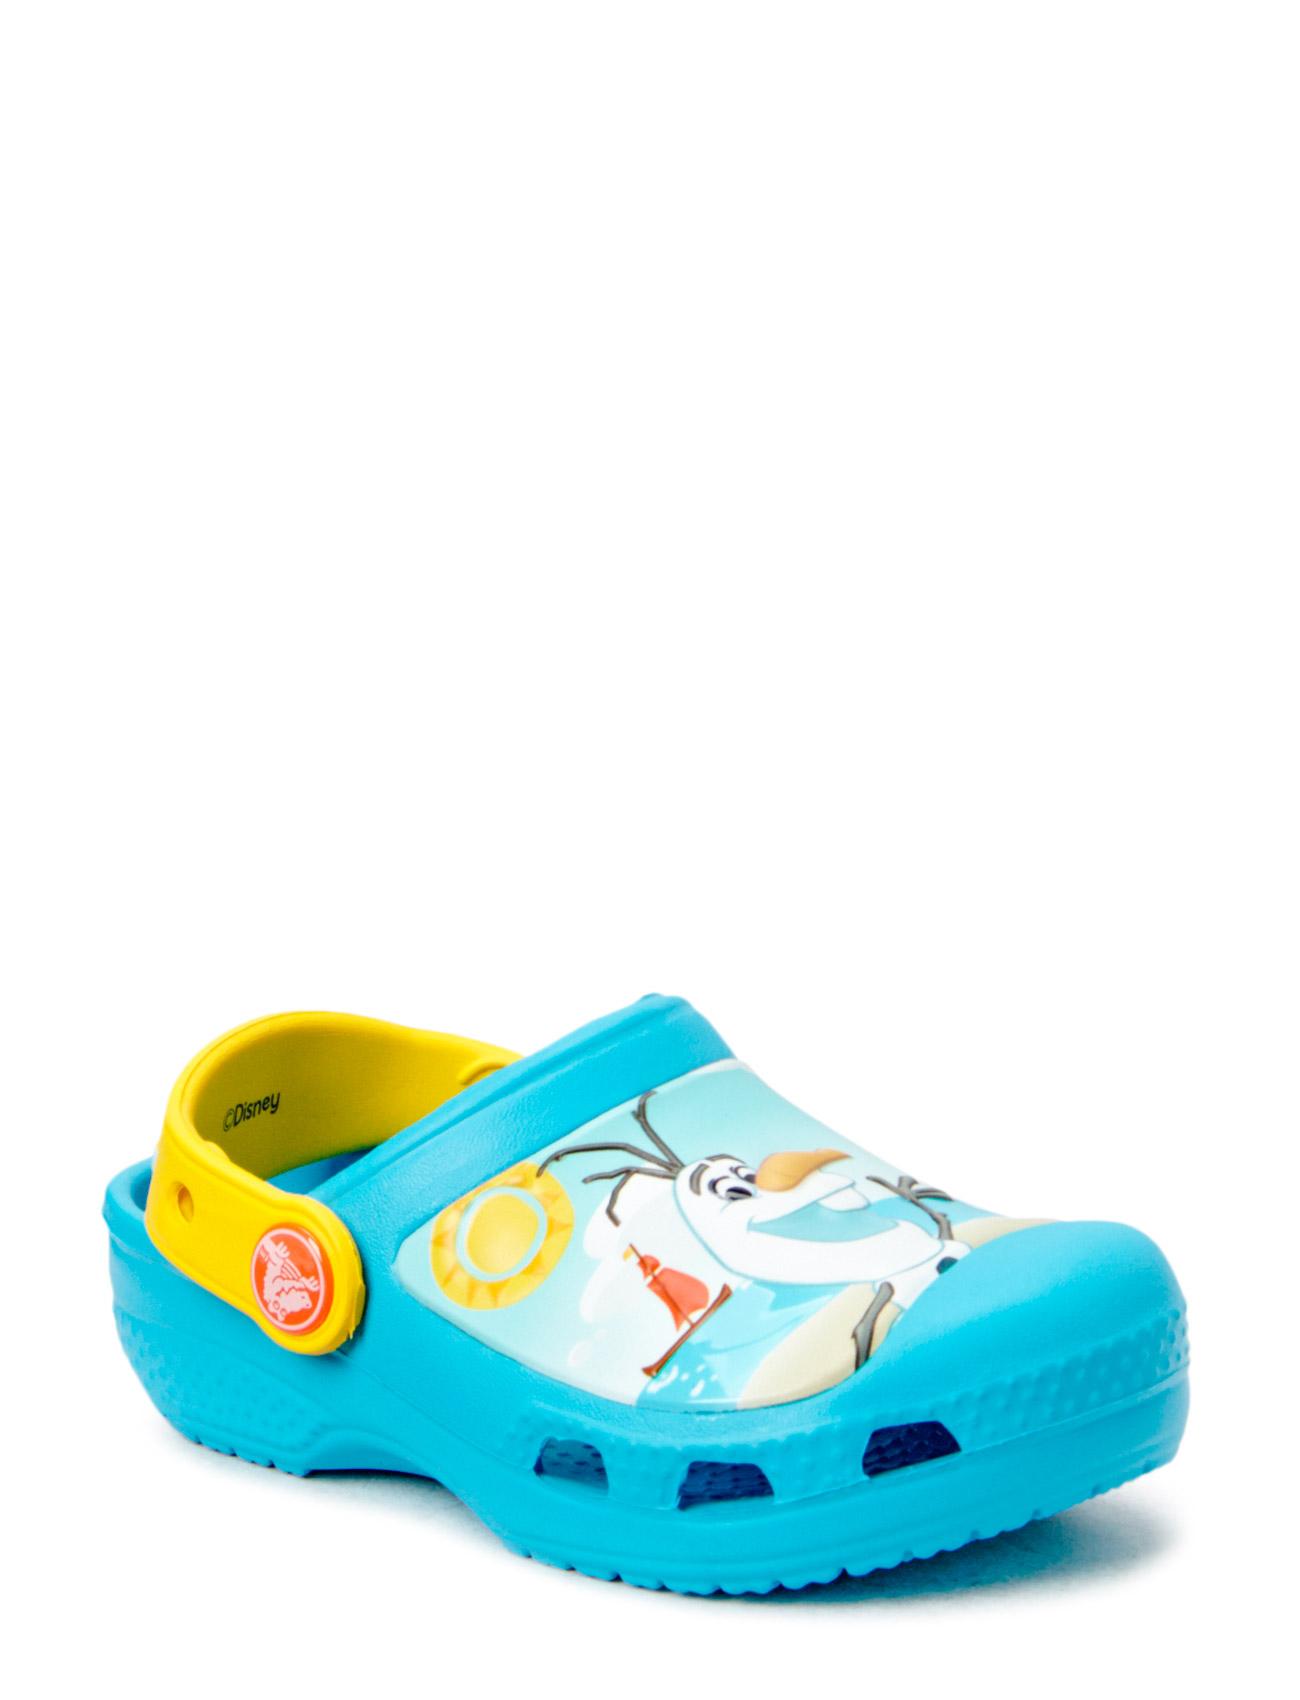 Creative Crocs Olaf Clog Crocs Sandaler til Børn i